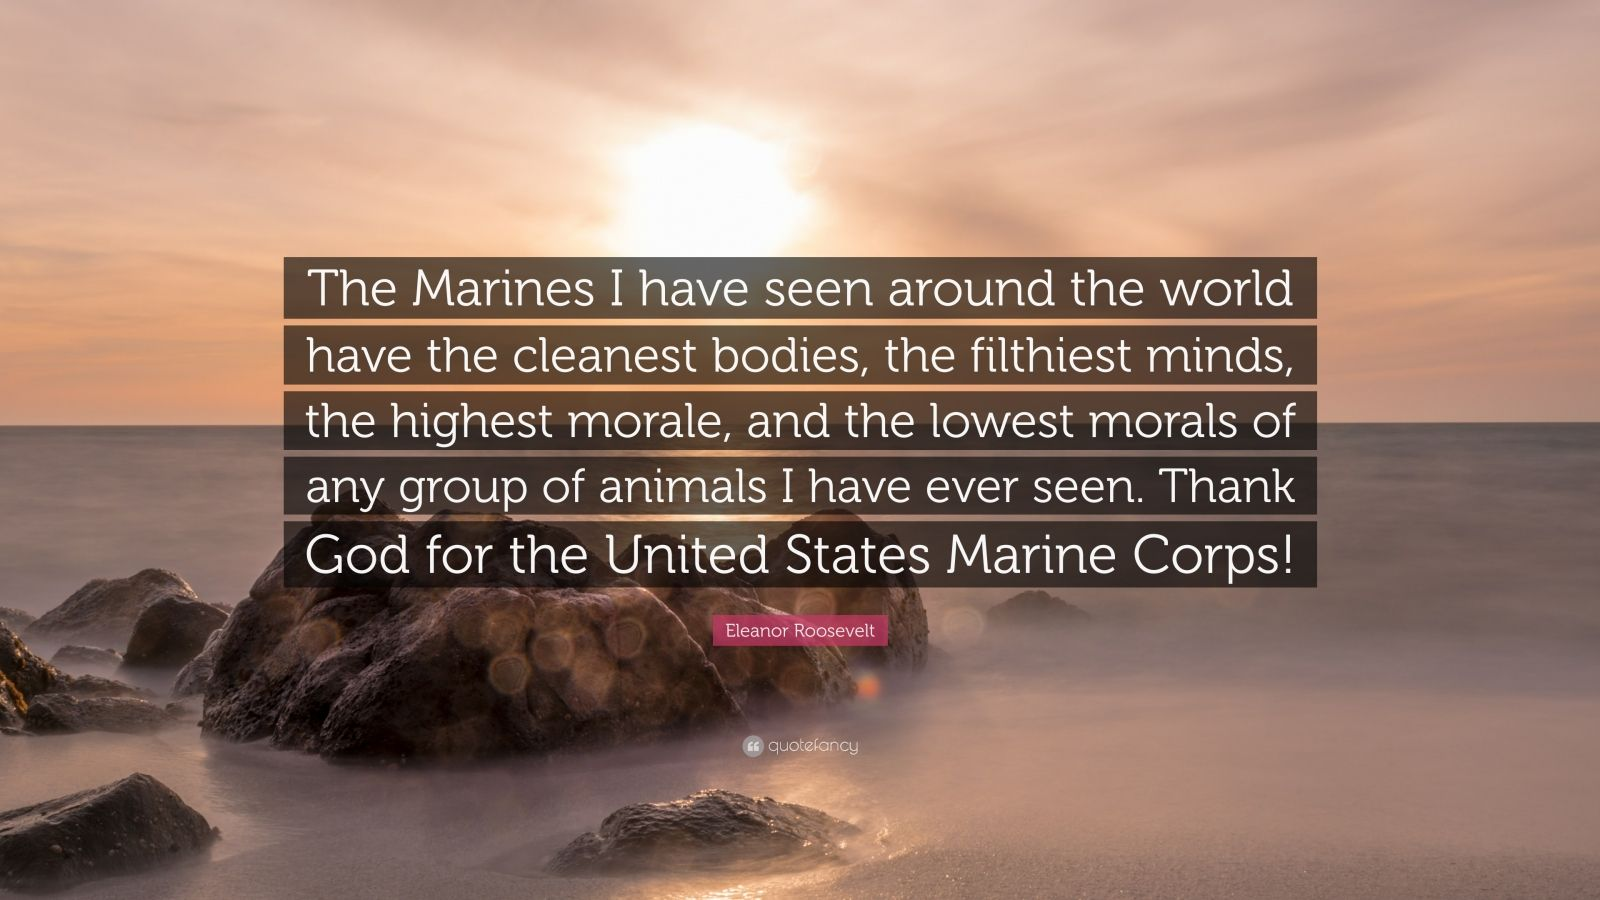 Eleanor Roosevelt Quotes Marines | Eleanor Roosevelt Marine Quote